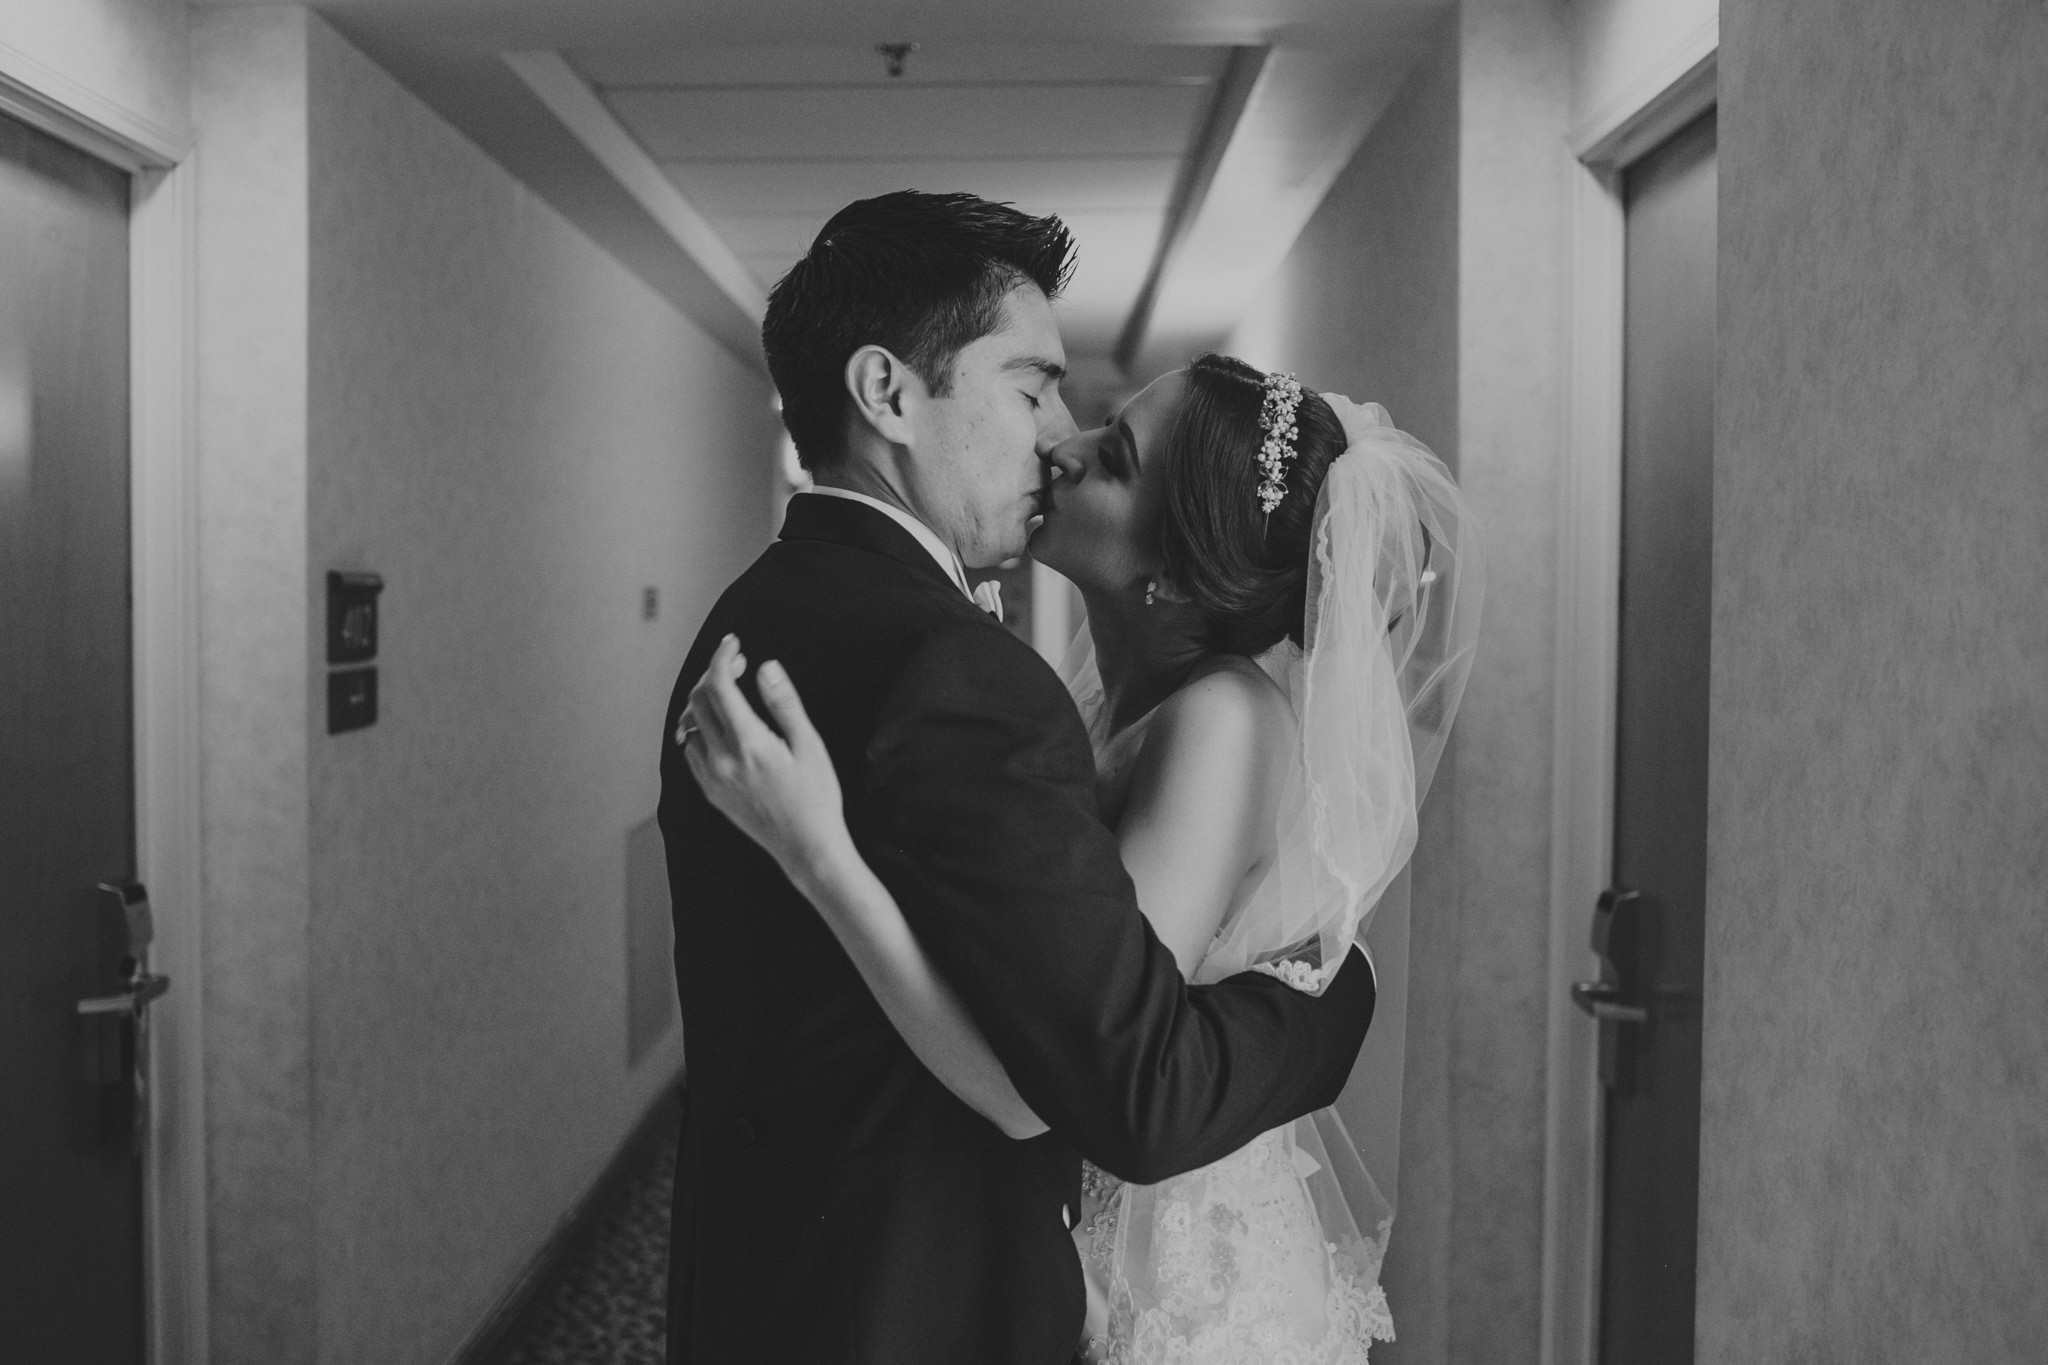 boda-en-torreon-armando-aragon-12